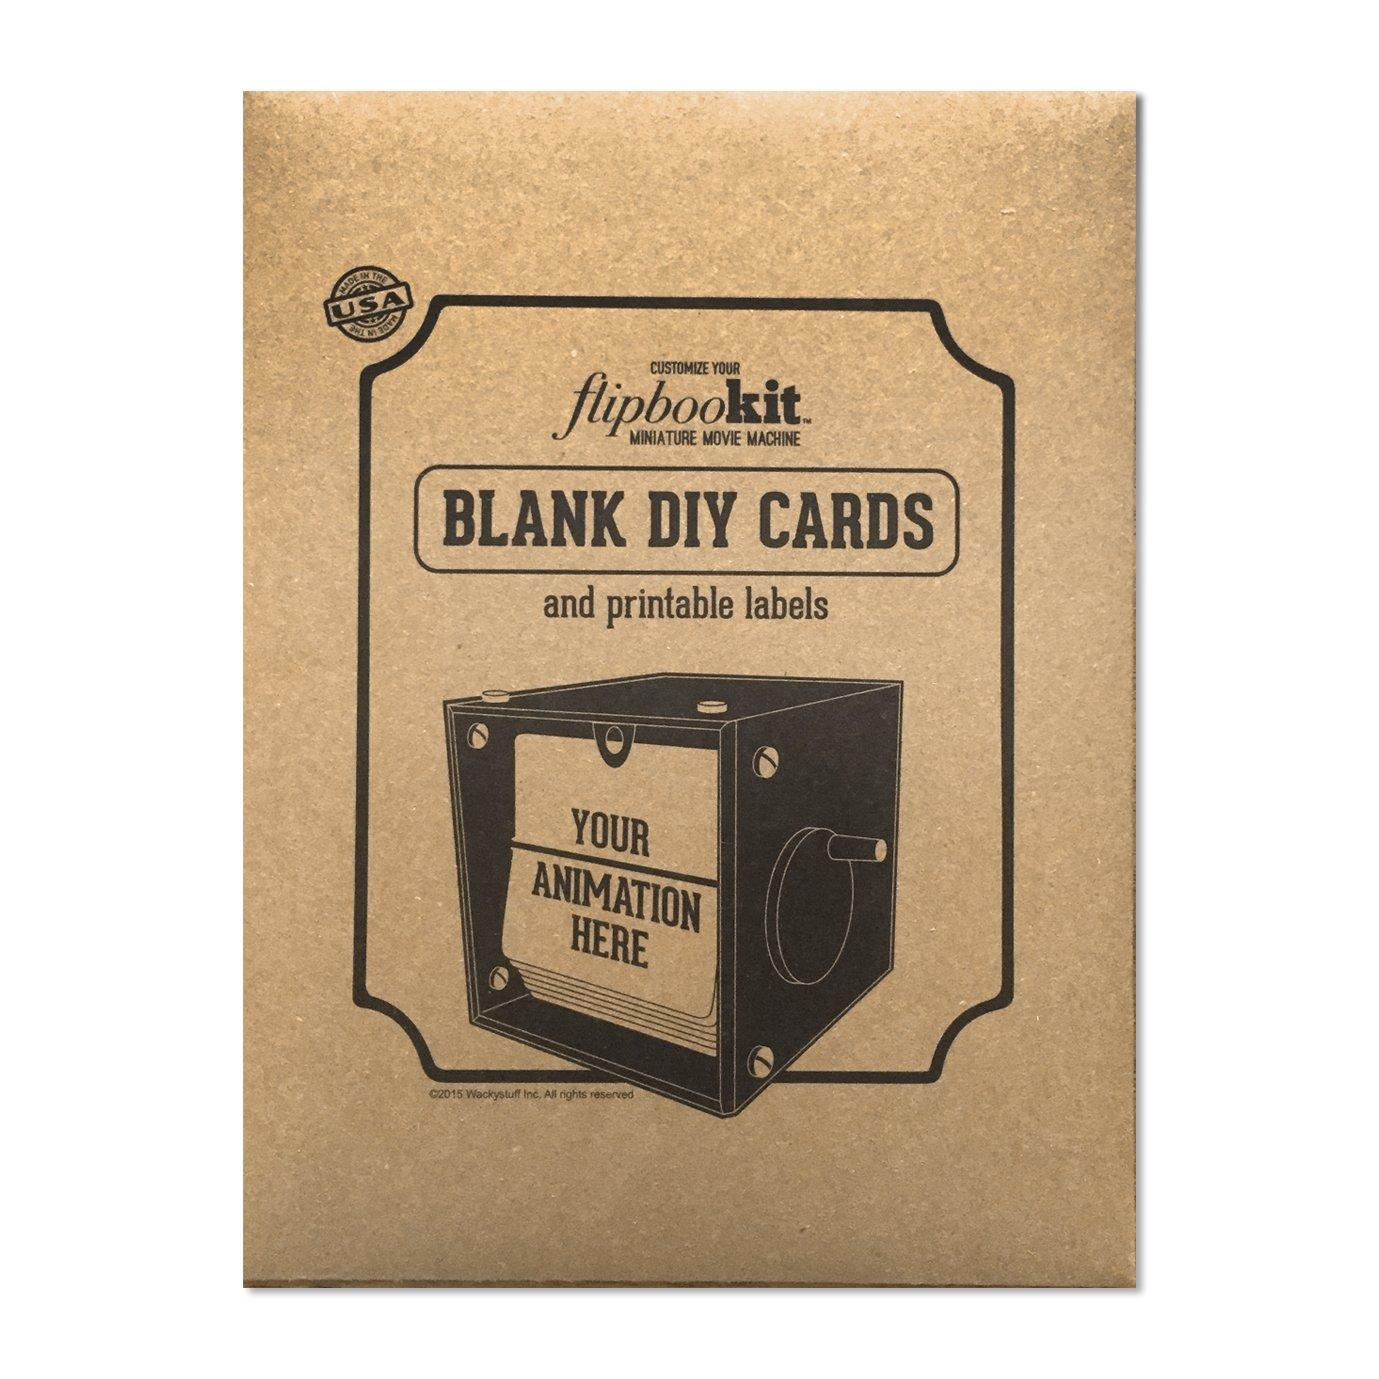 Flipbookit Blank DIY Cards and Printable Labels (1 pack)